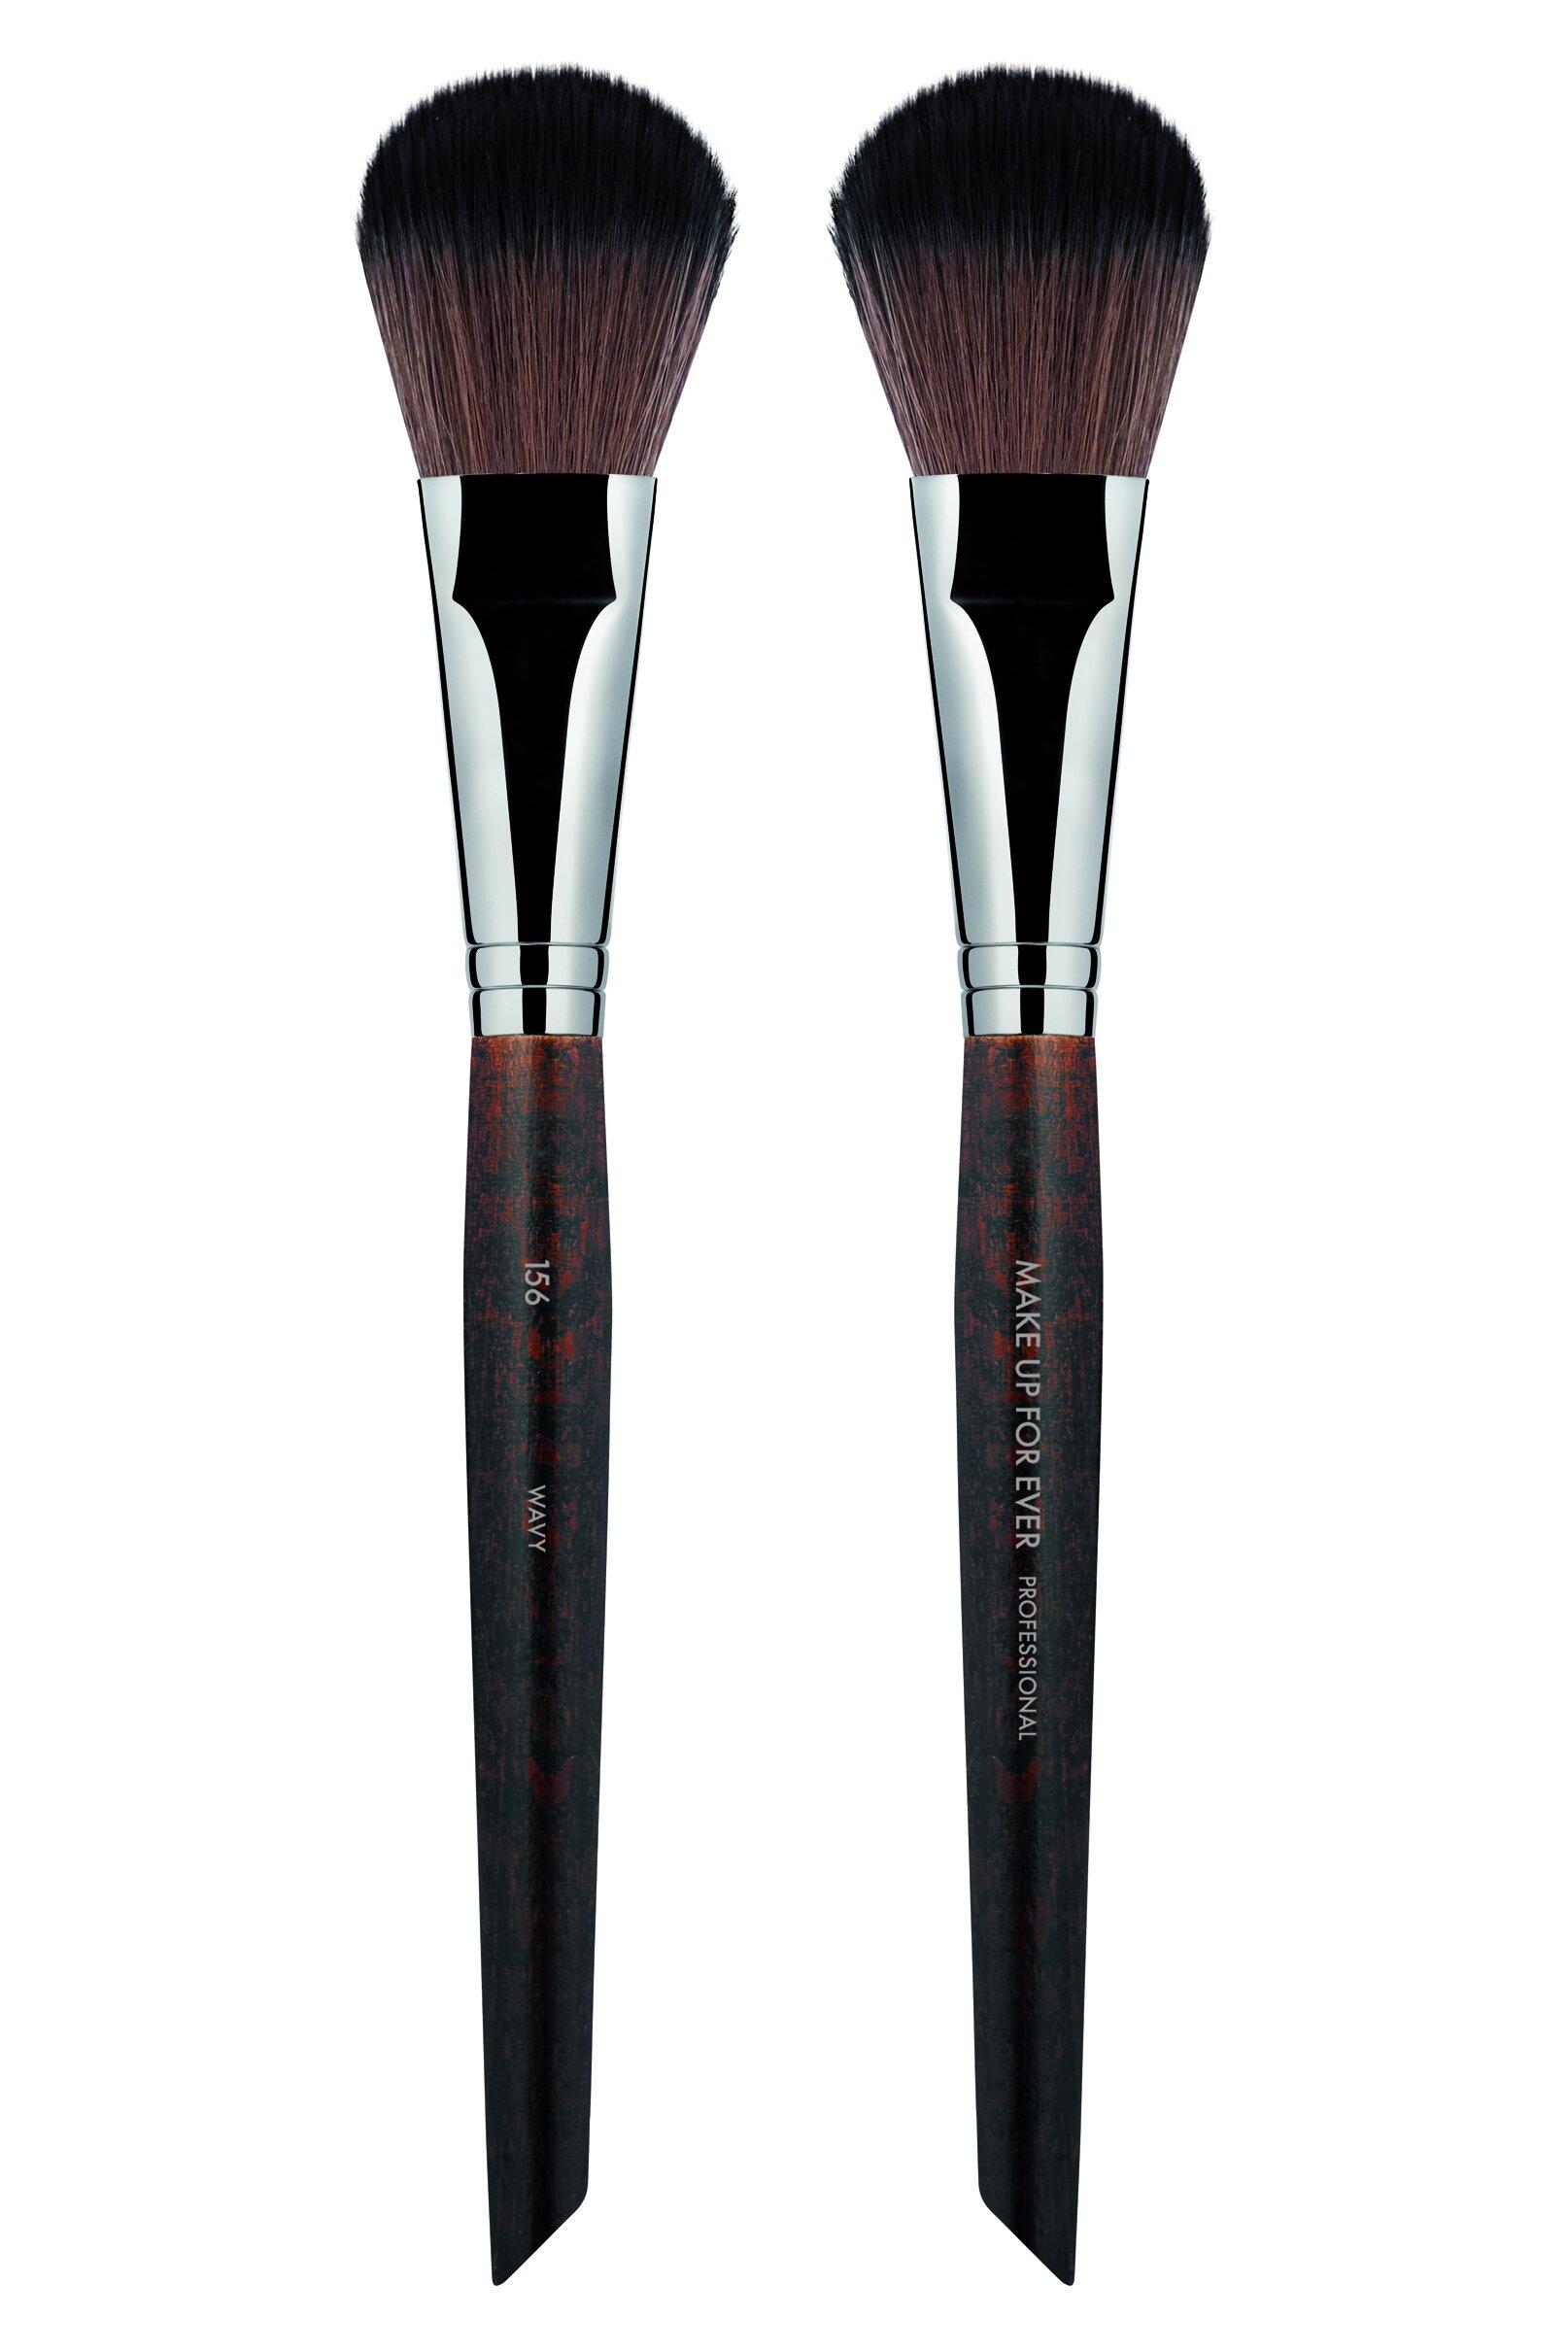 Make Up For Ever 156 Large Flat Blush Brush — JEN EVOY ...